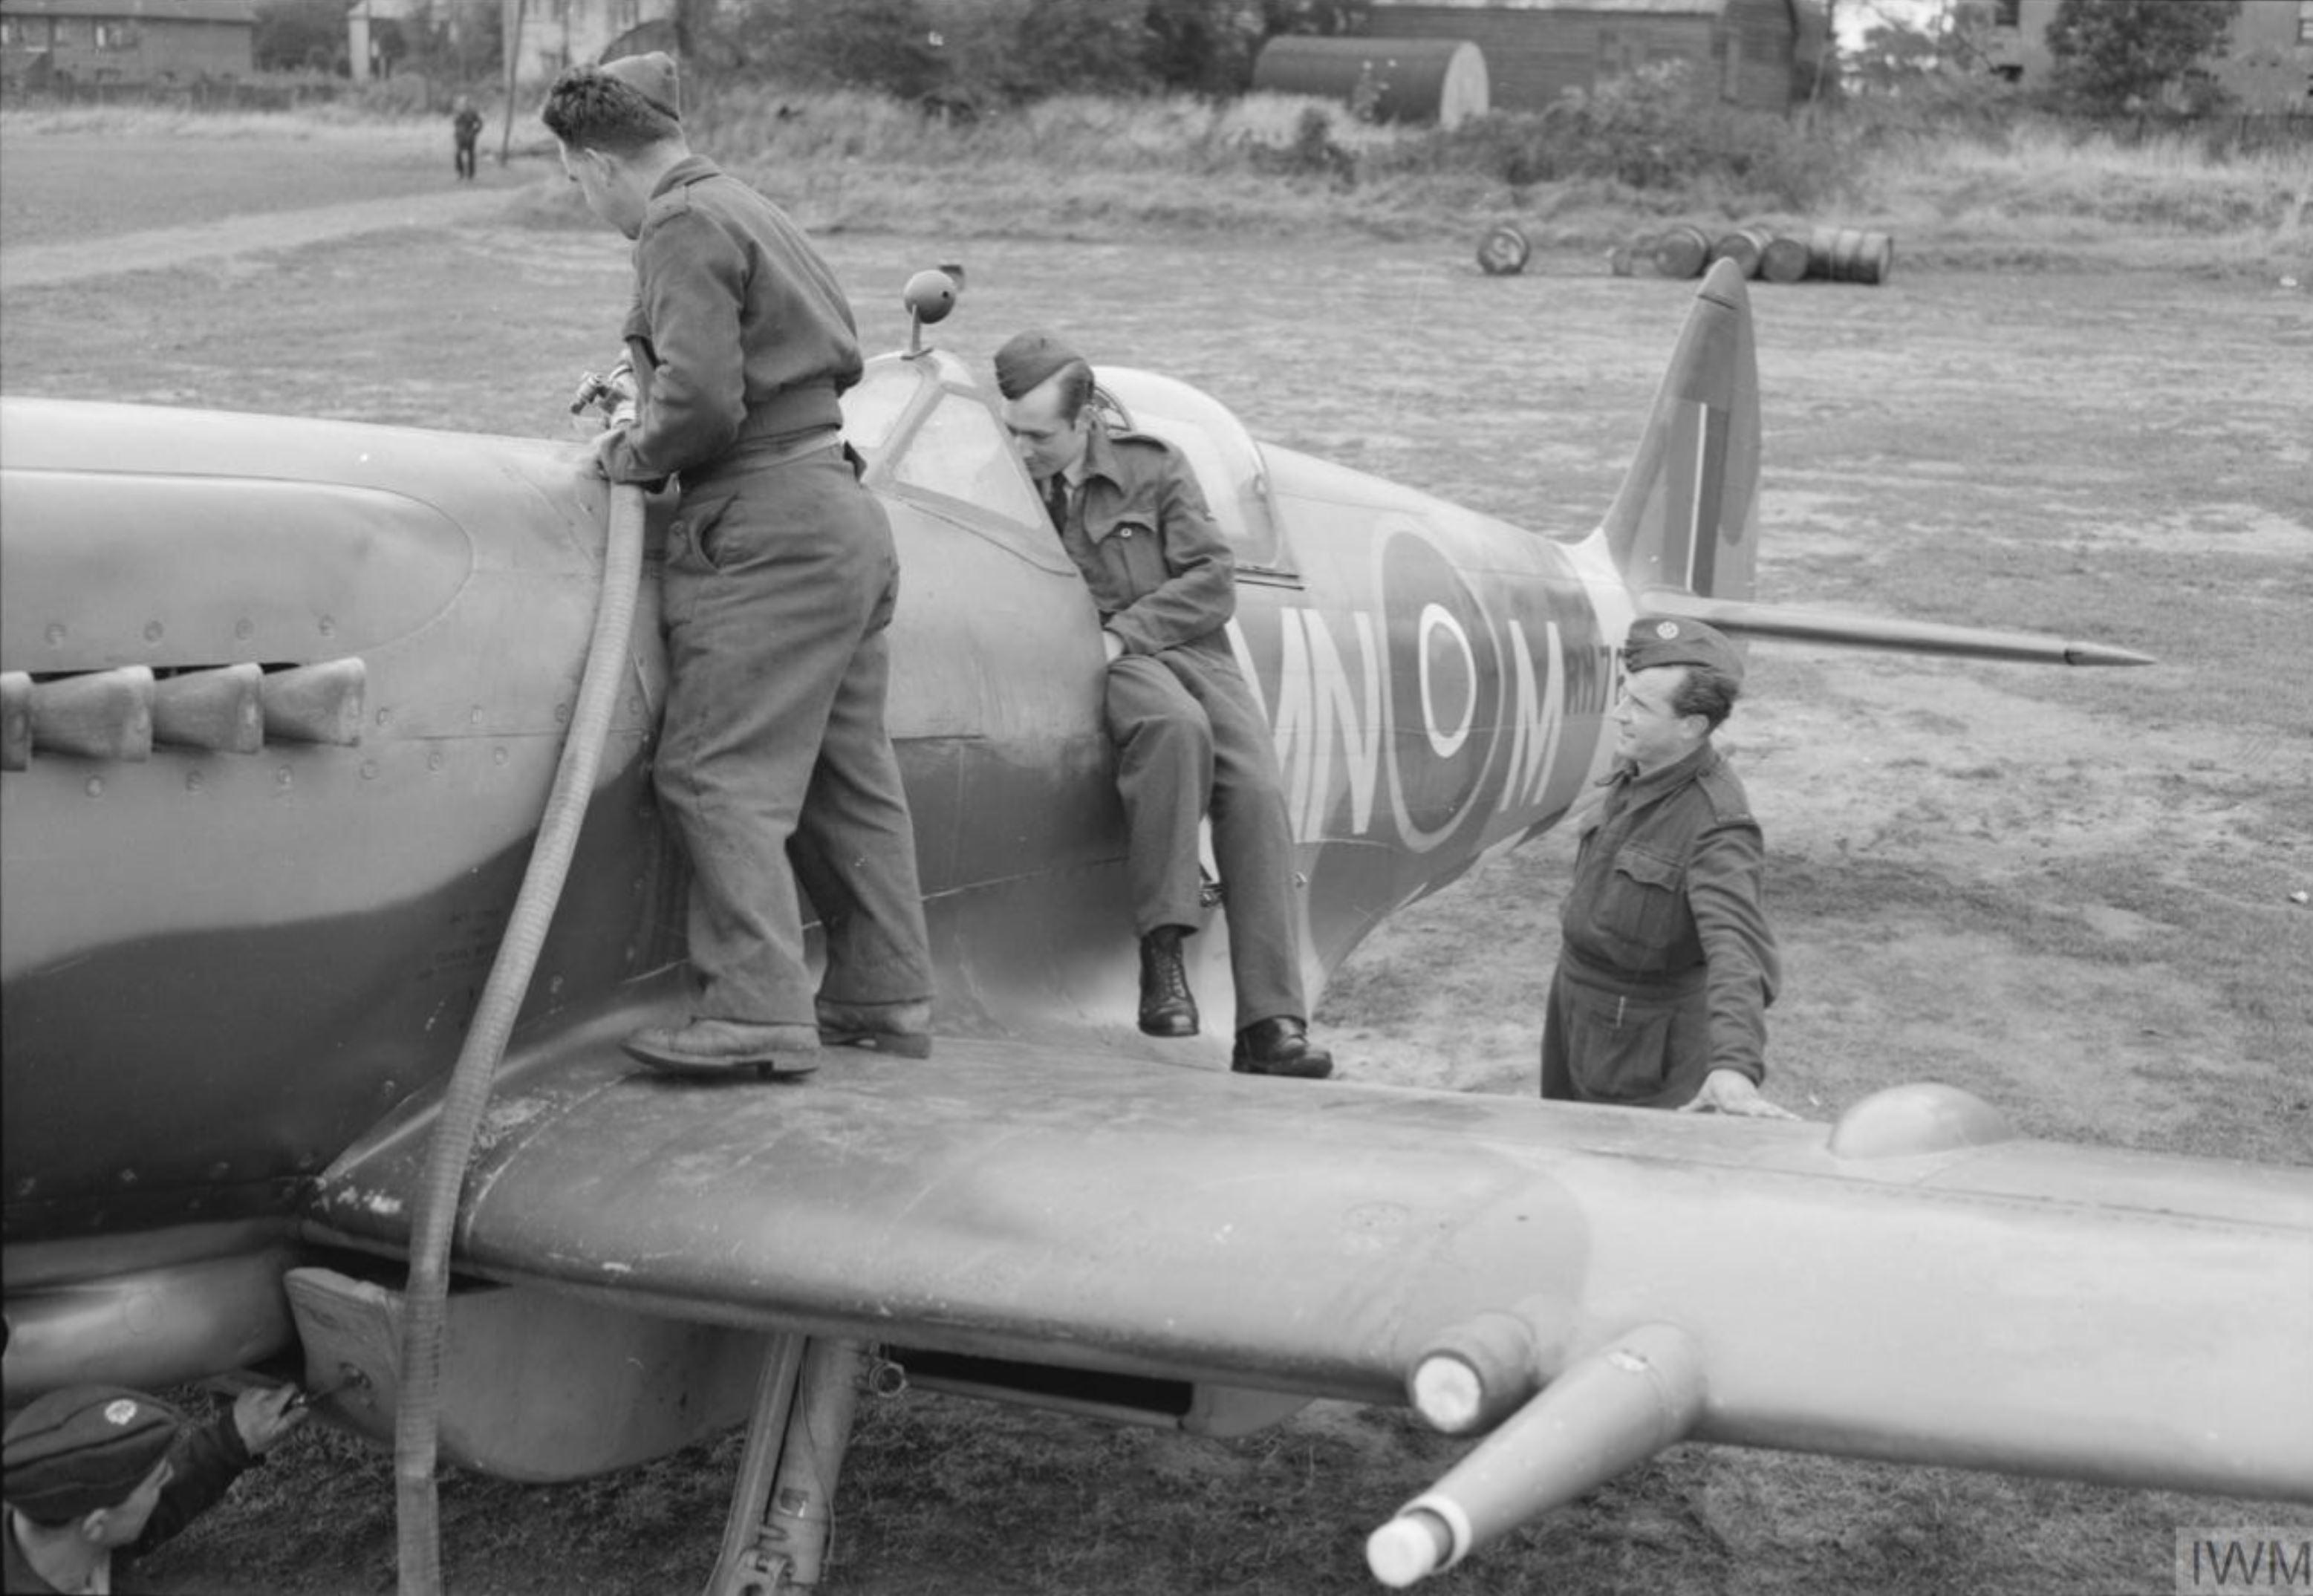 Spitfire XIVe RAF 350Sqn MNM RM764 at Lympne Kent IWM CL1360